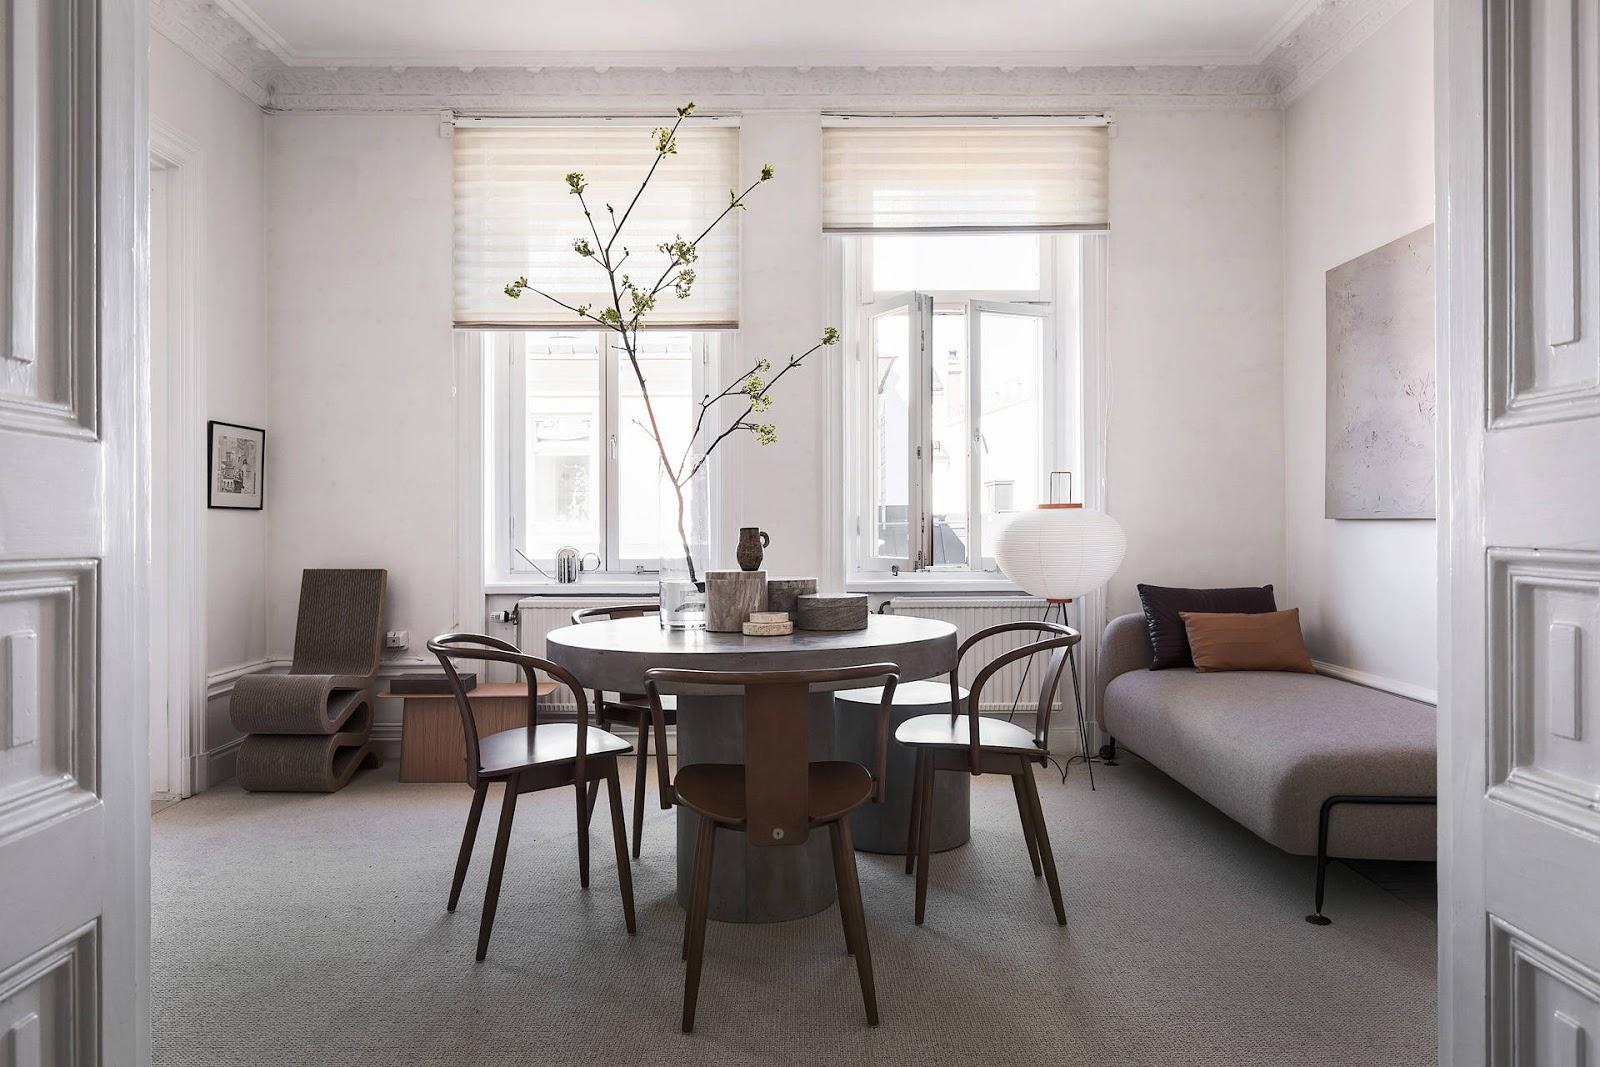 Appartamento con tonalità calde e fredde by Annaleena Leino  ARC ART blog by Daniele Drigo